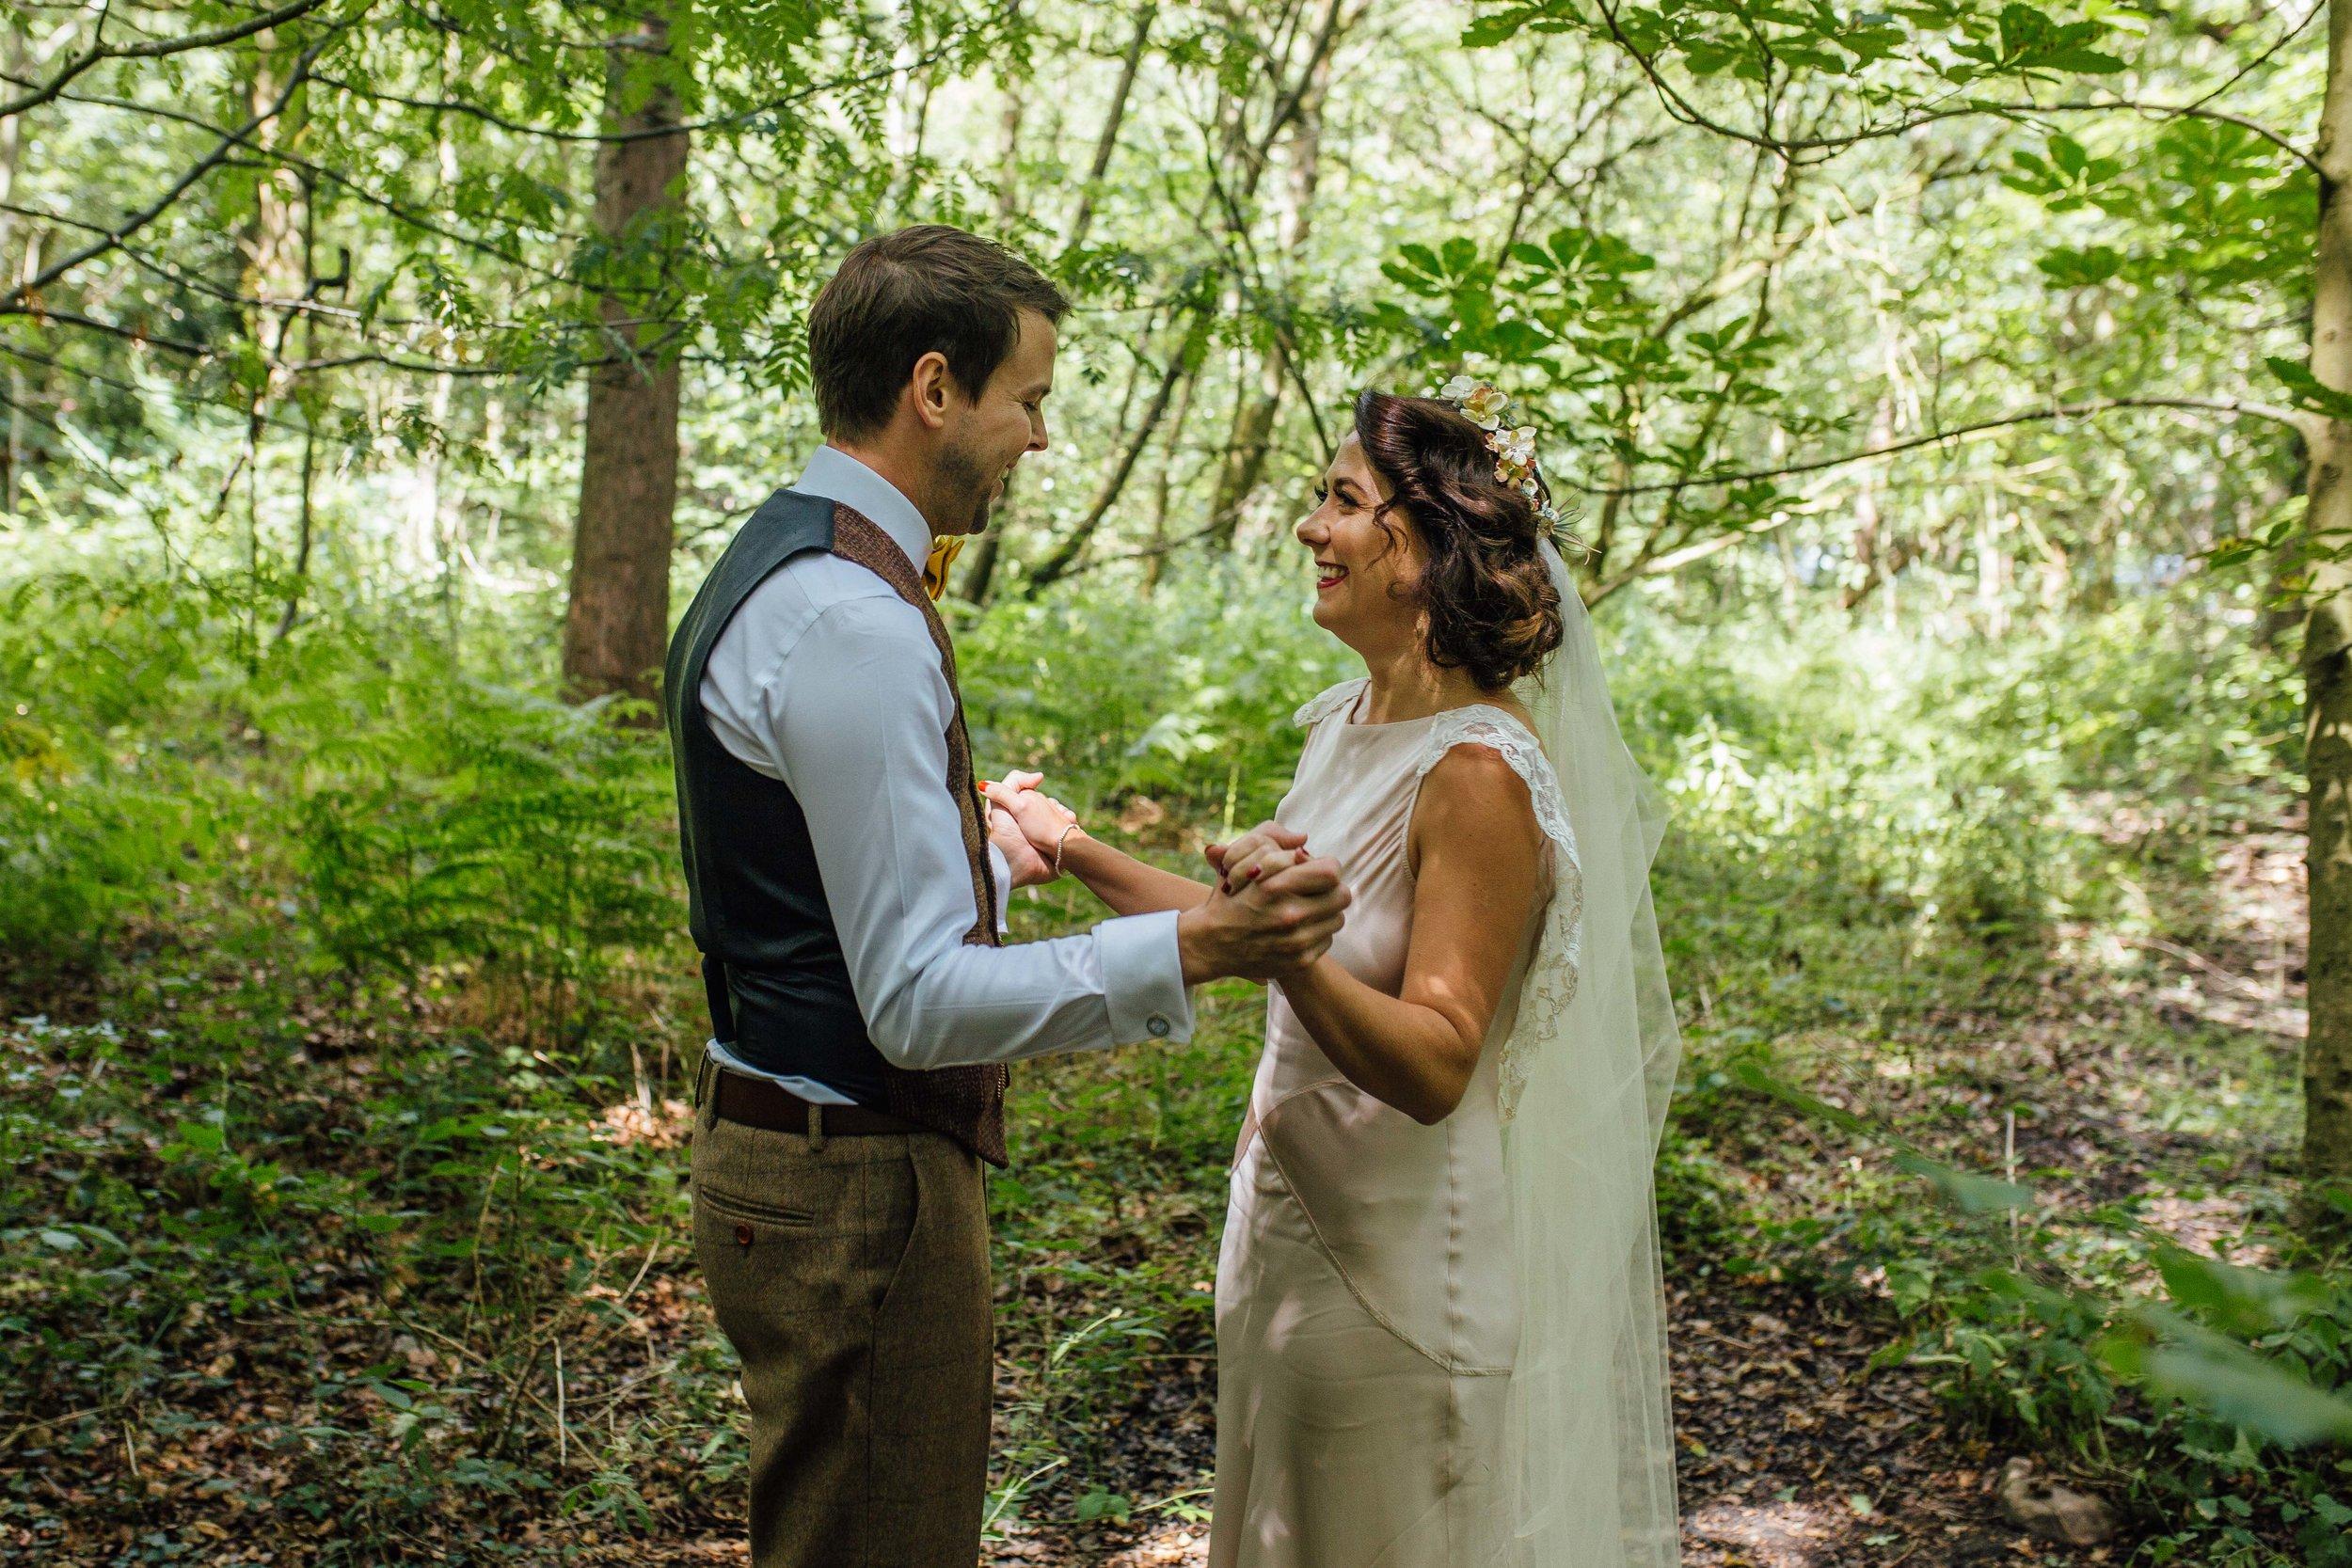 Katy-Bespoke-Veil-Sheffield-Wedding-Wes-Anderson-Susanna-Greening-Derbyshire-7